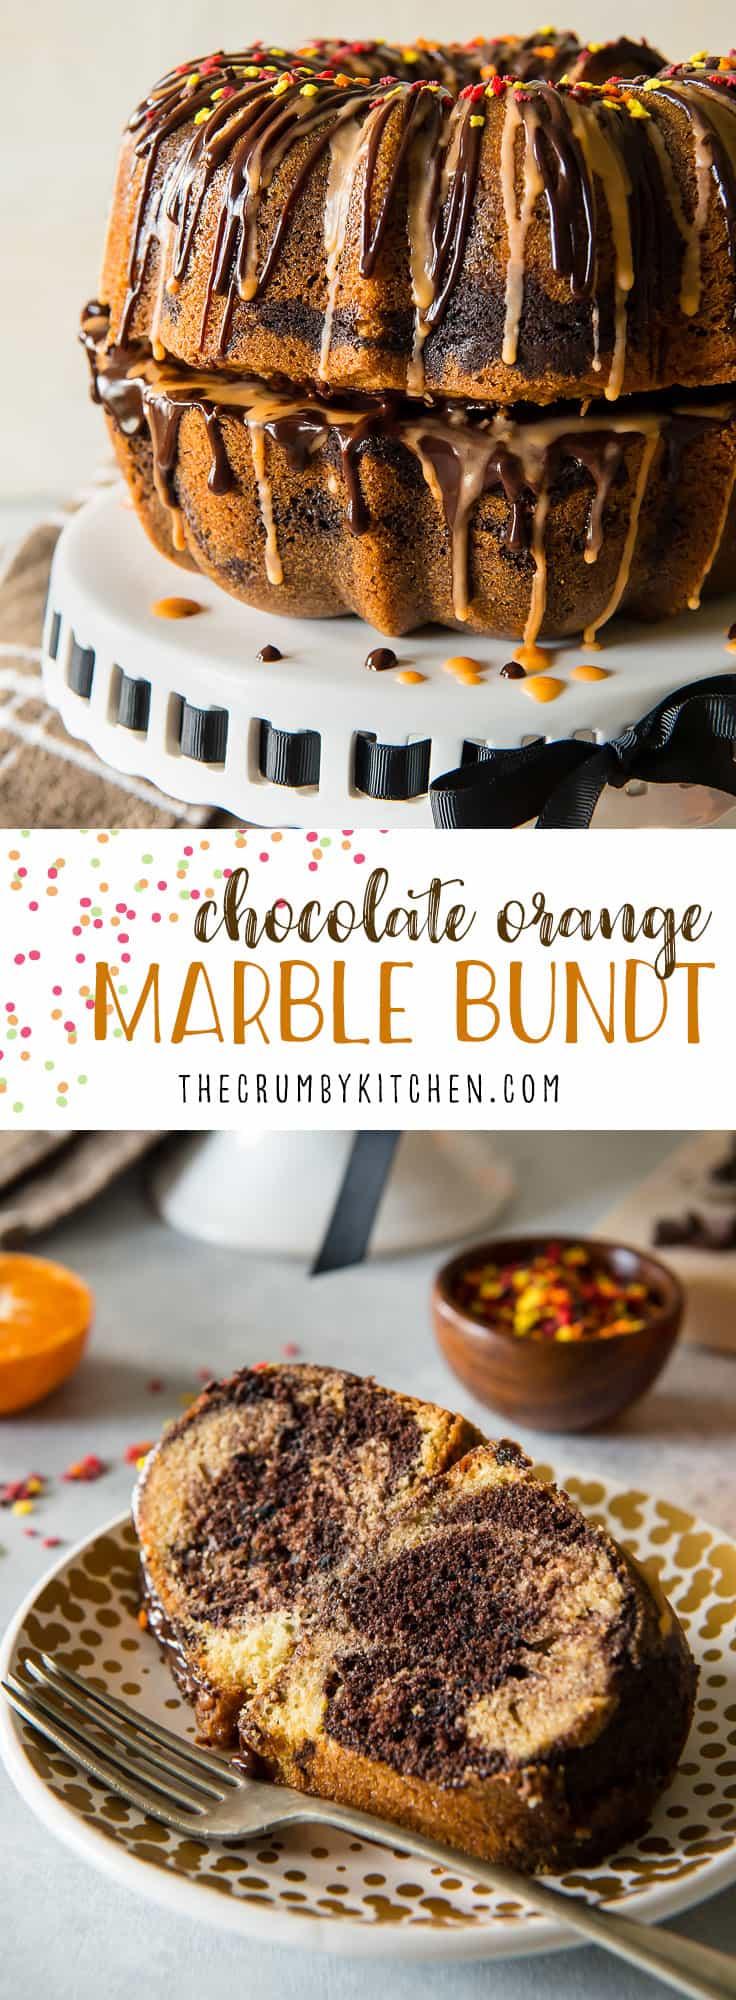 Chocolate Bundt Cake With Orange Glaze